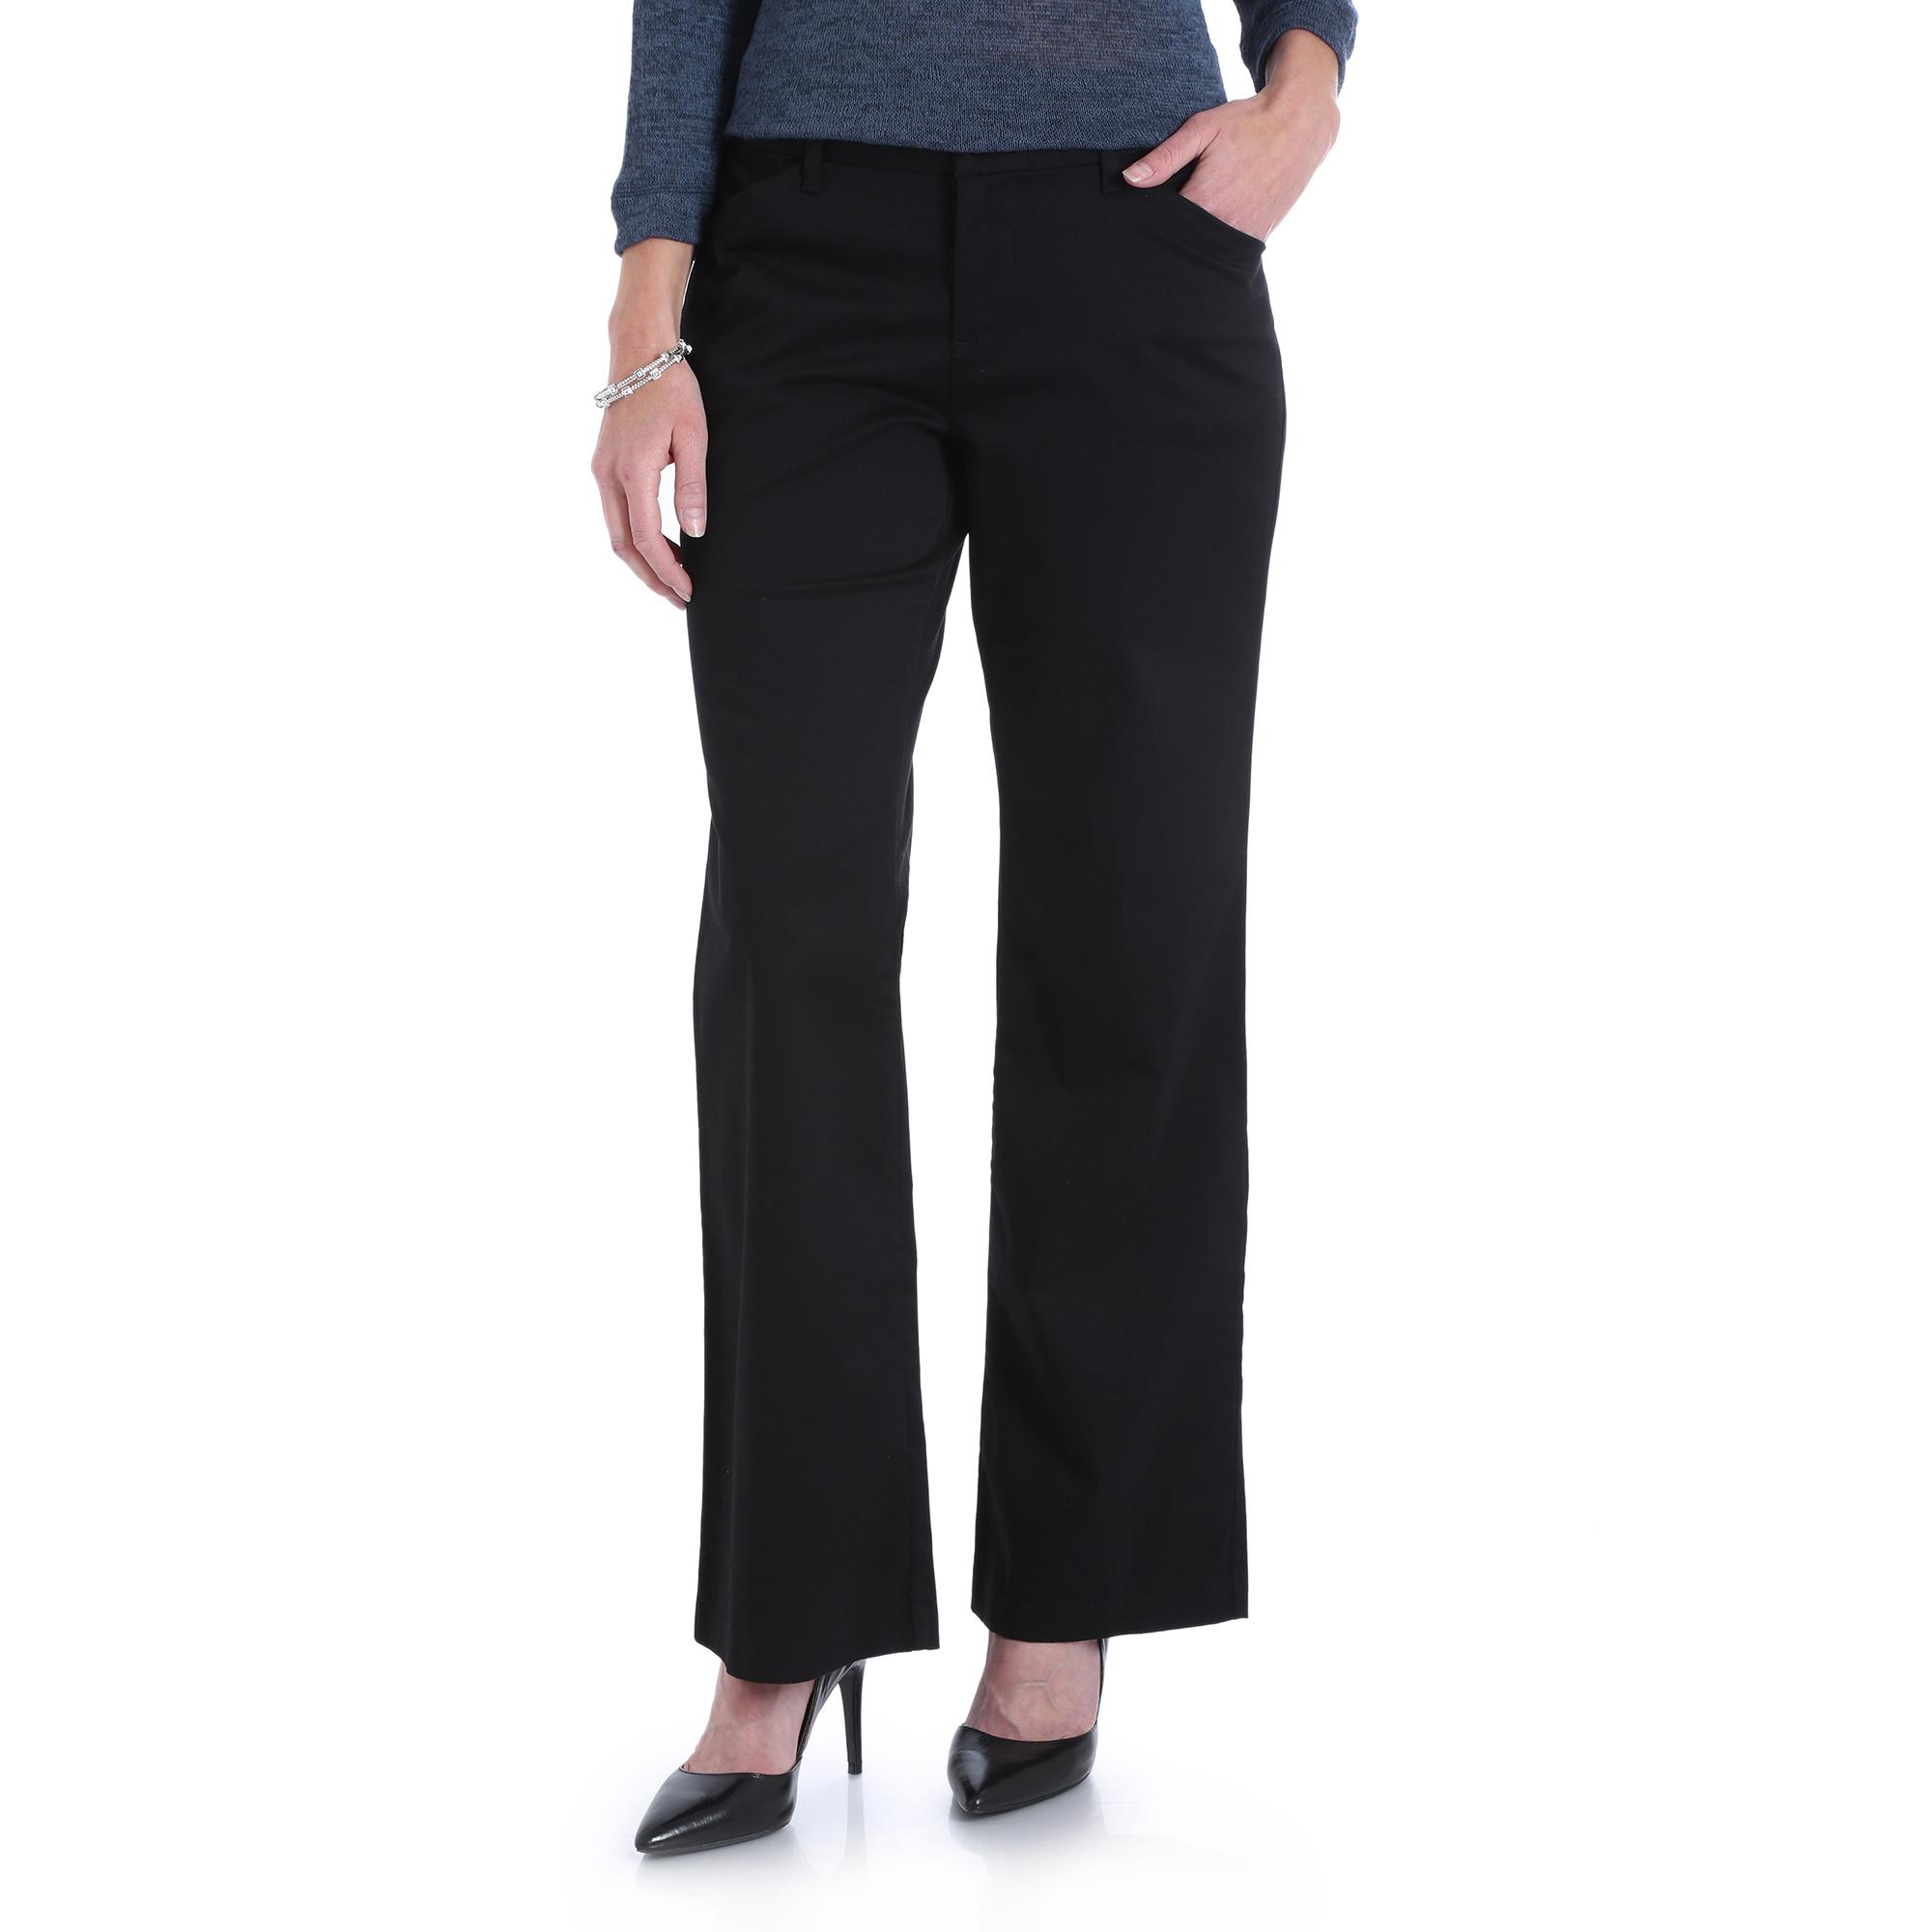 W36CT08 - Knit Curvy Trouser